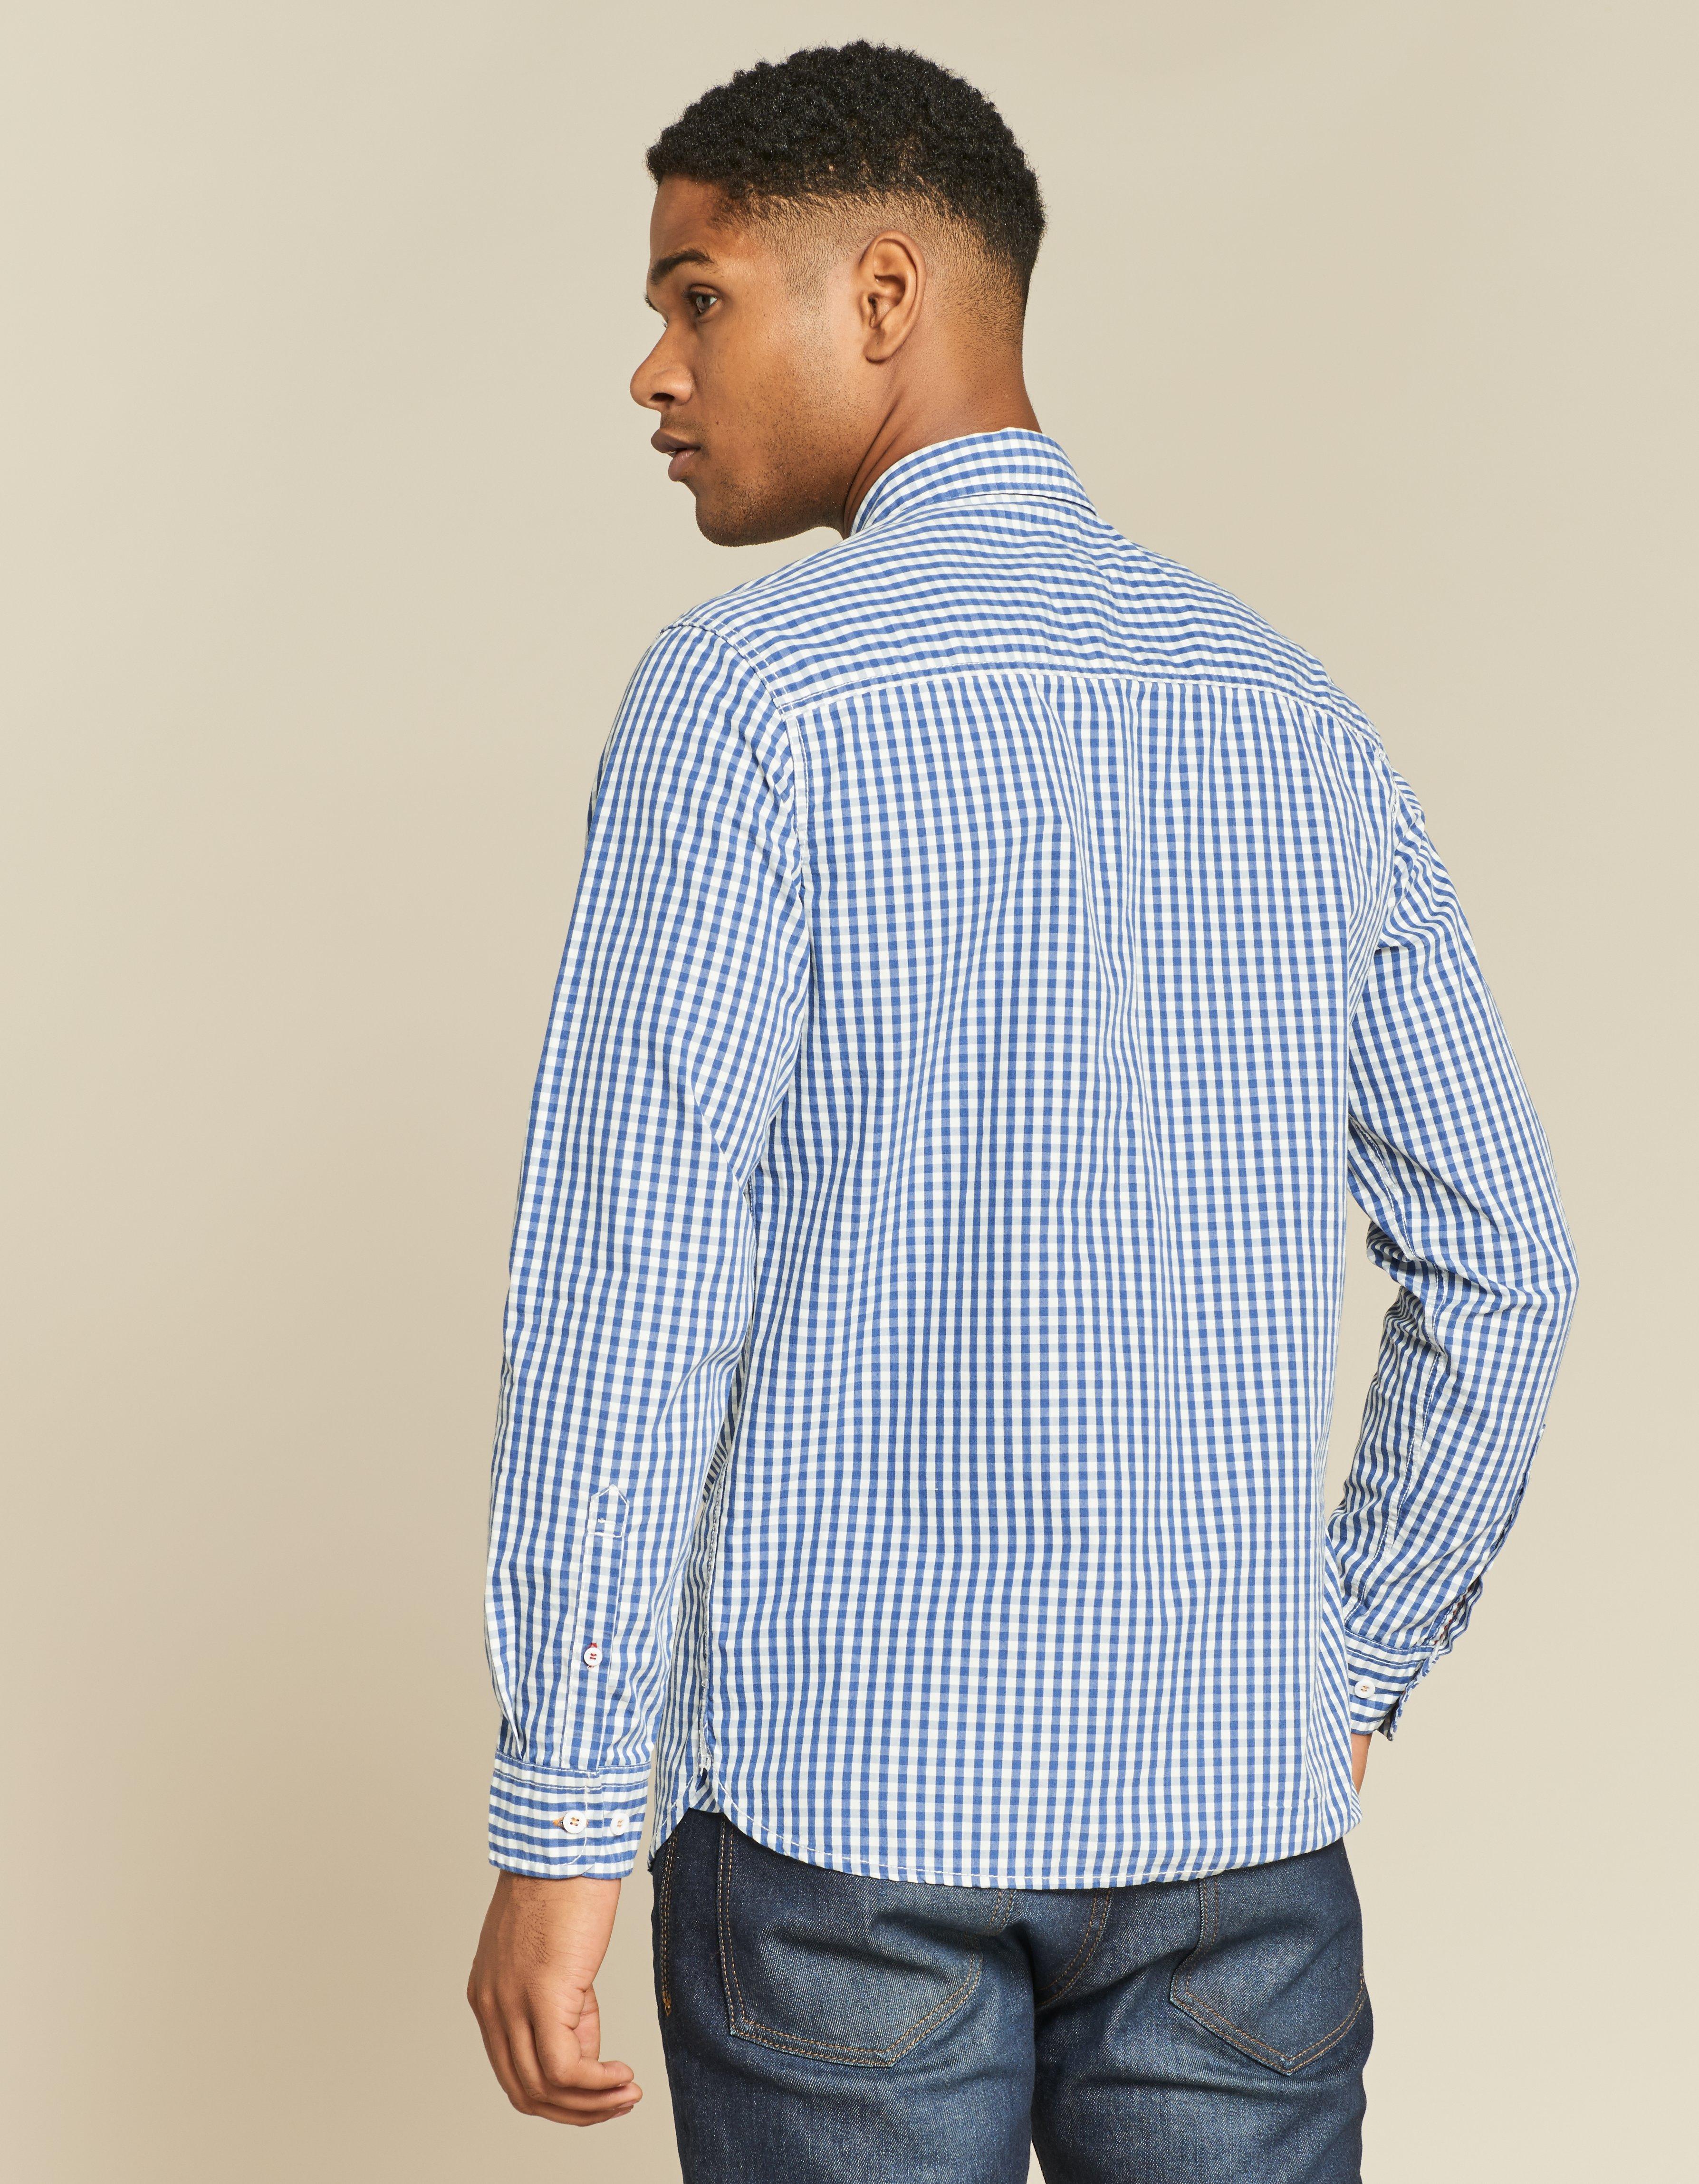 Medford Gingham Shirt